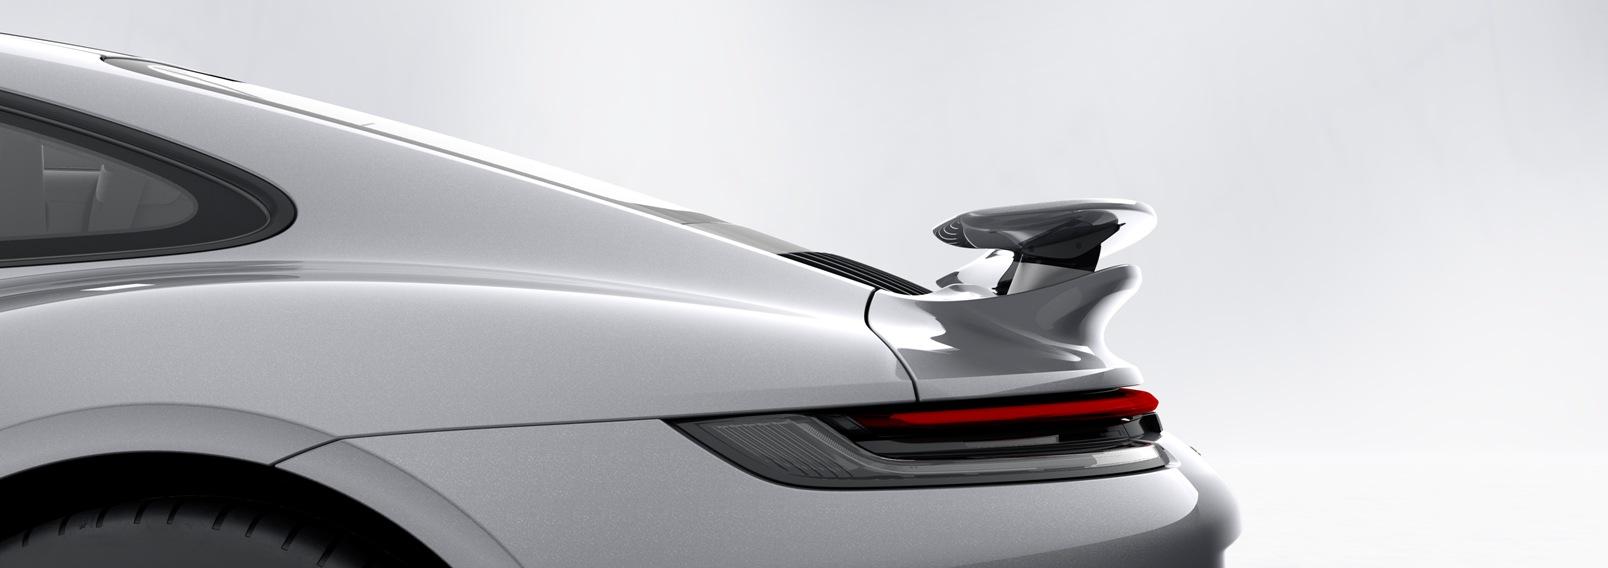 Aerodinámica Porsche 911 Turbo S (8)